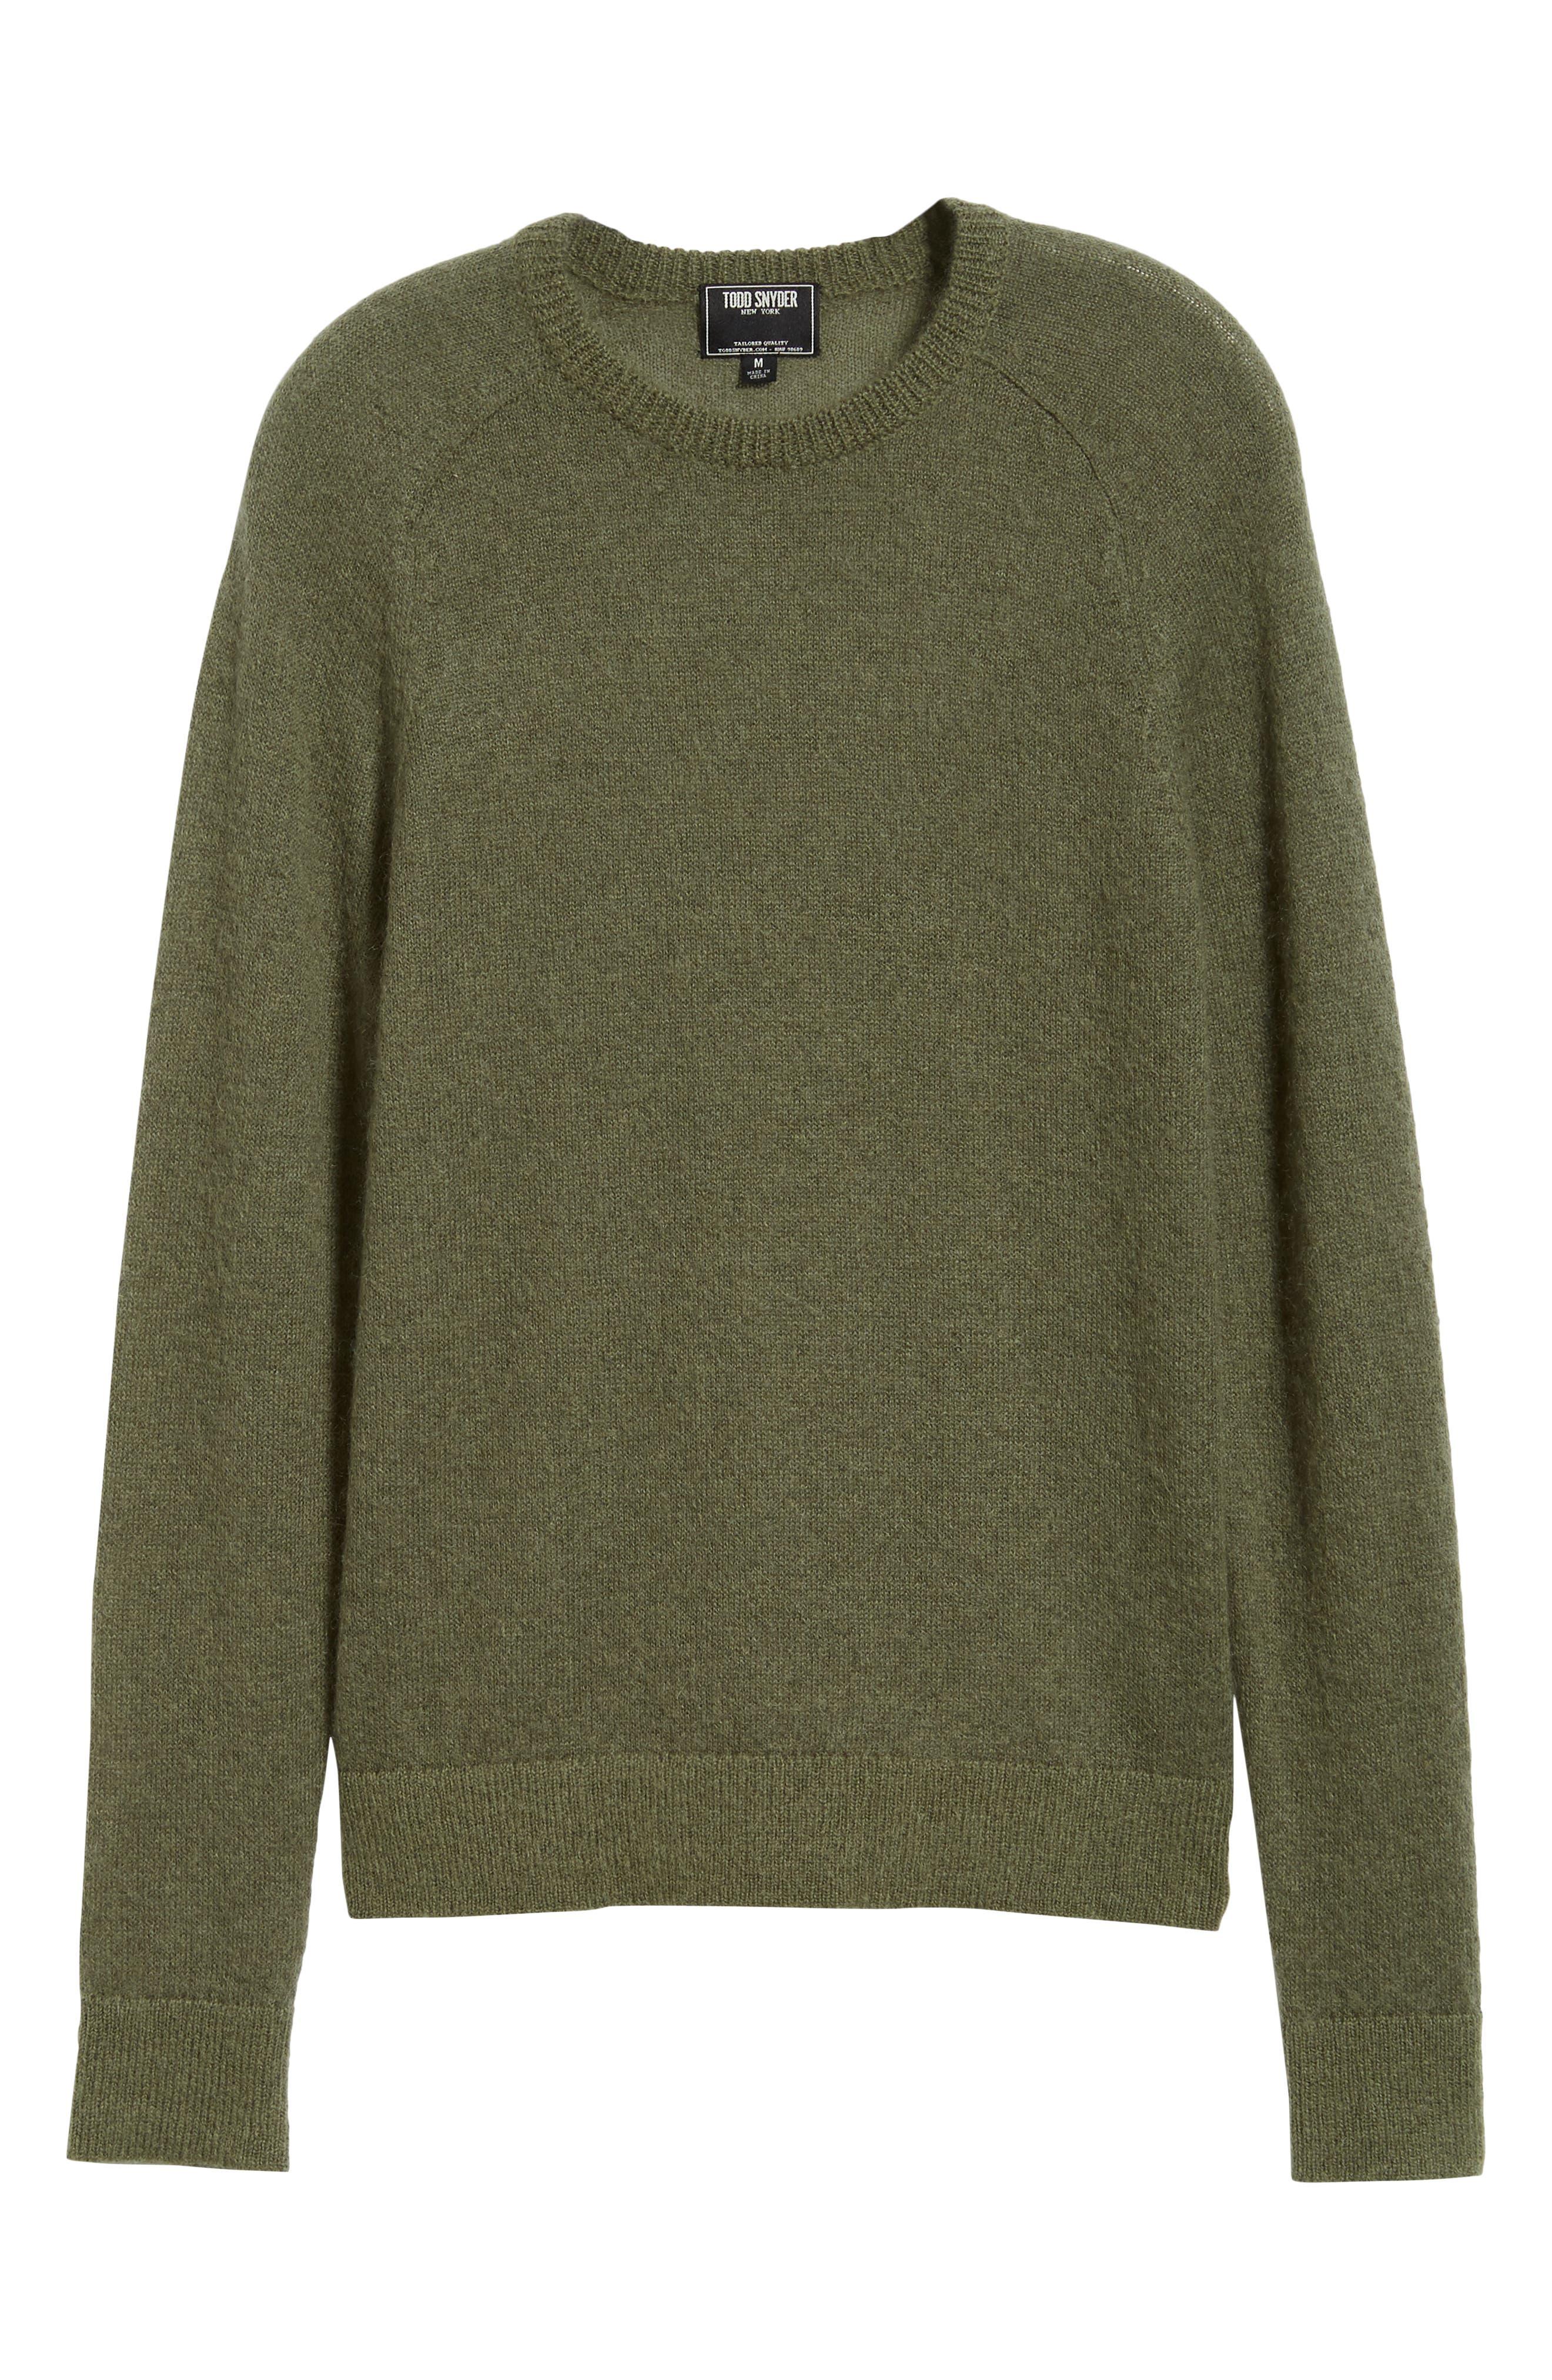 Mohair Blend Crewneck Sweater,                             Alternate thumbnail 6, color,                             340